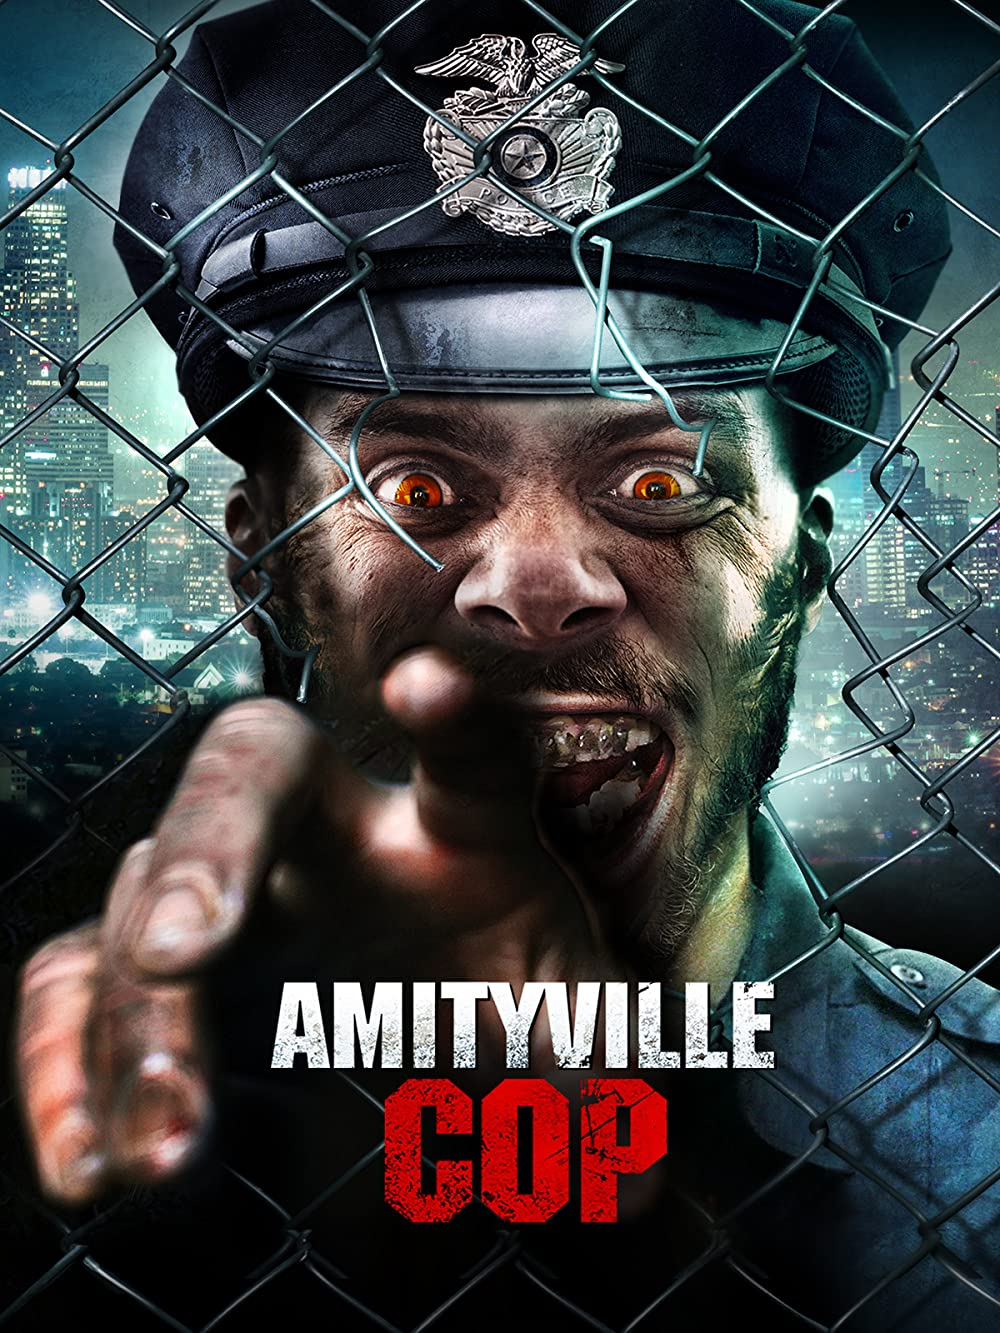 Amityville Cop 2021 English 720p HDRip 800MB Download